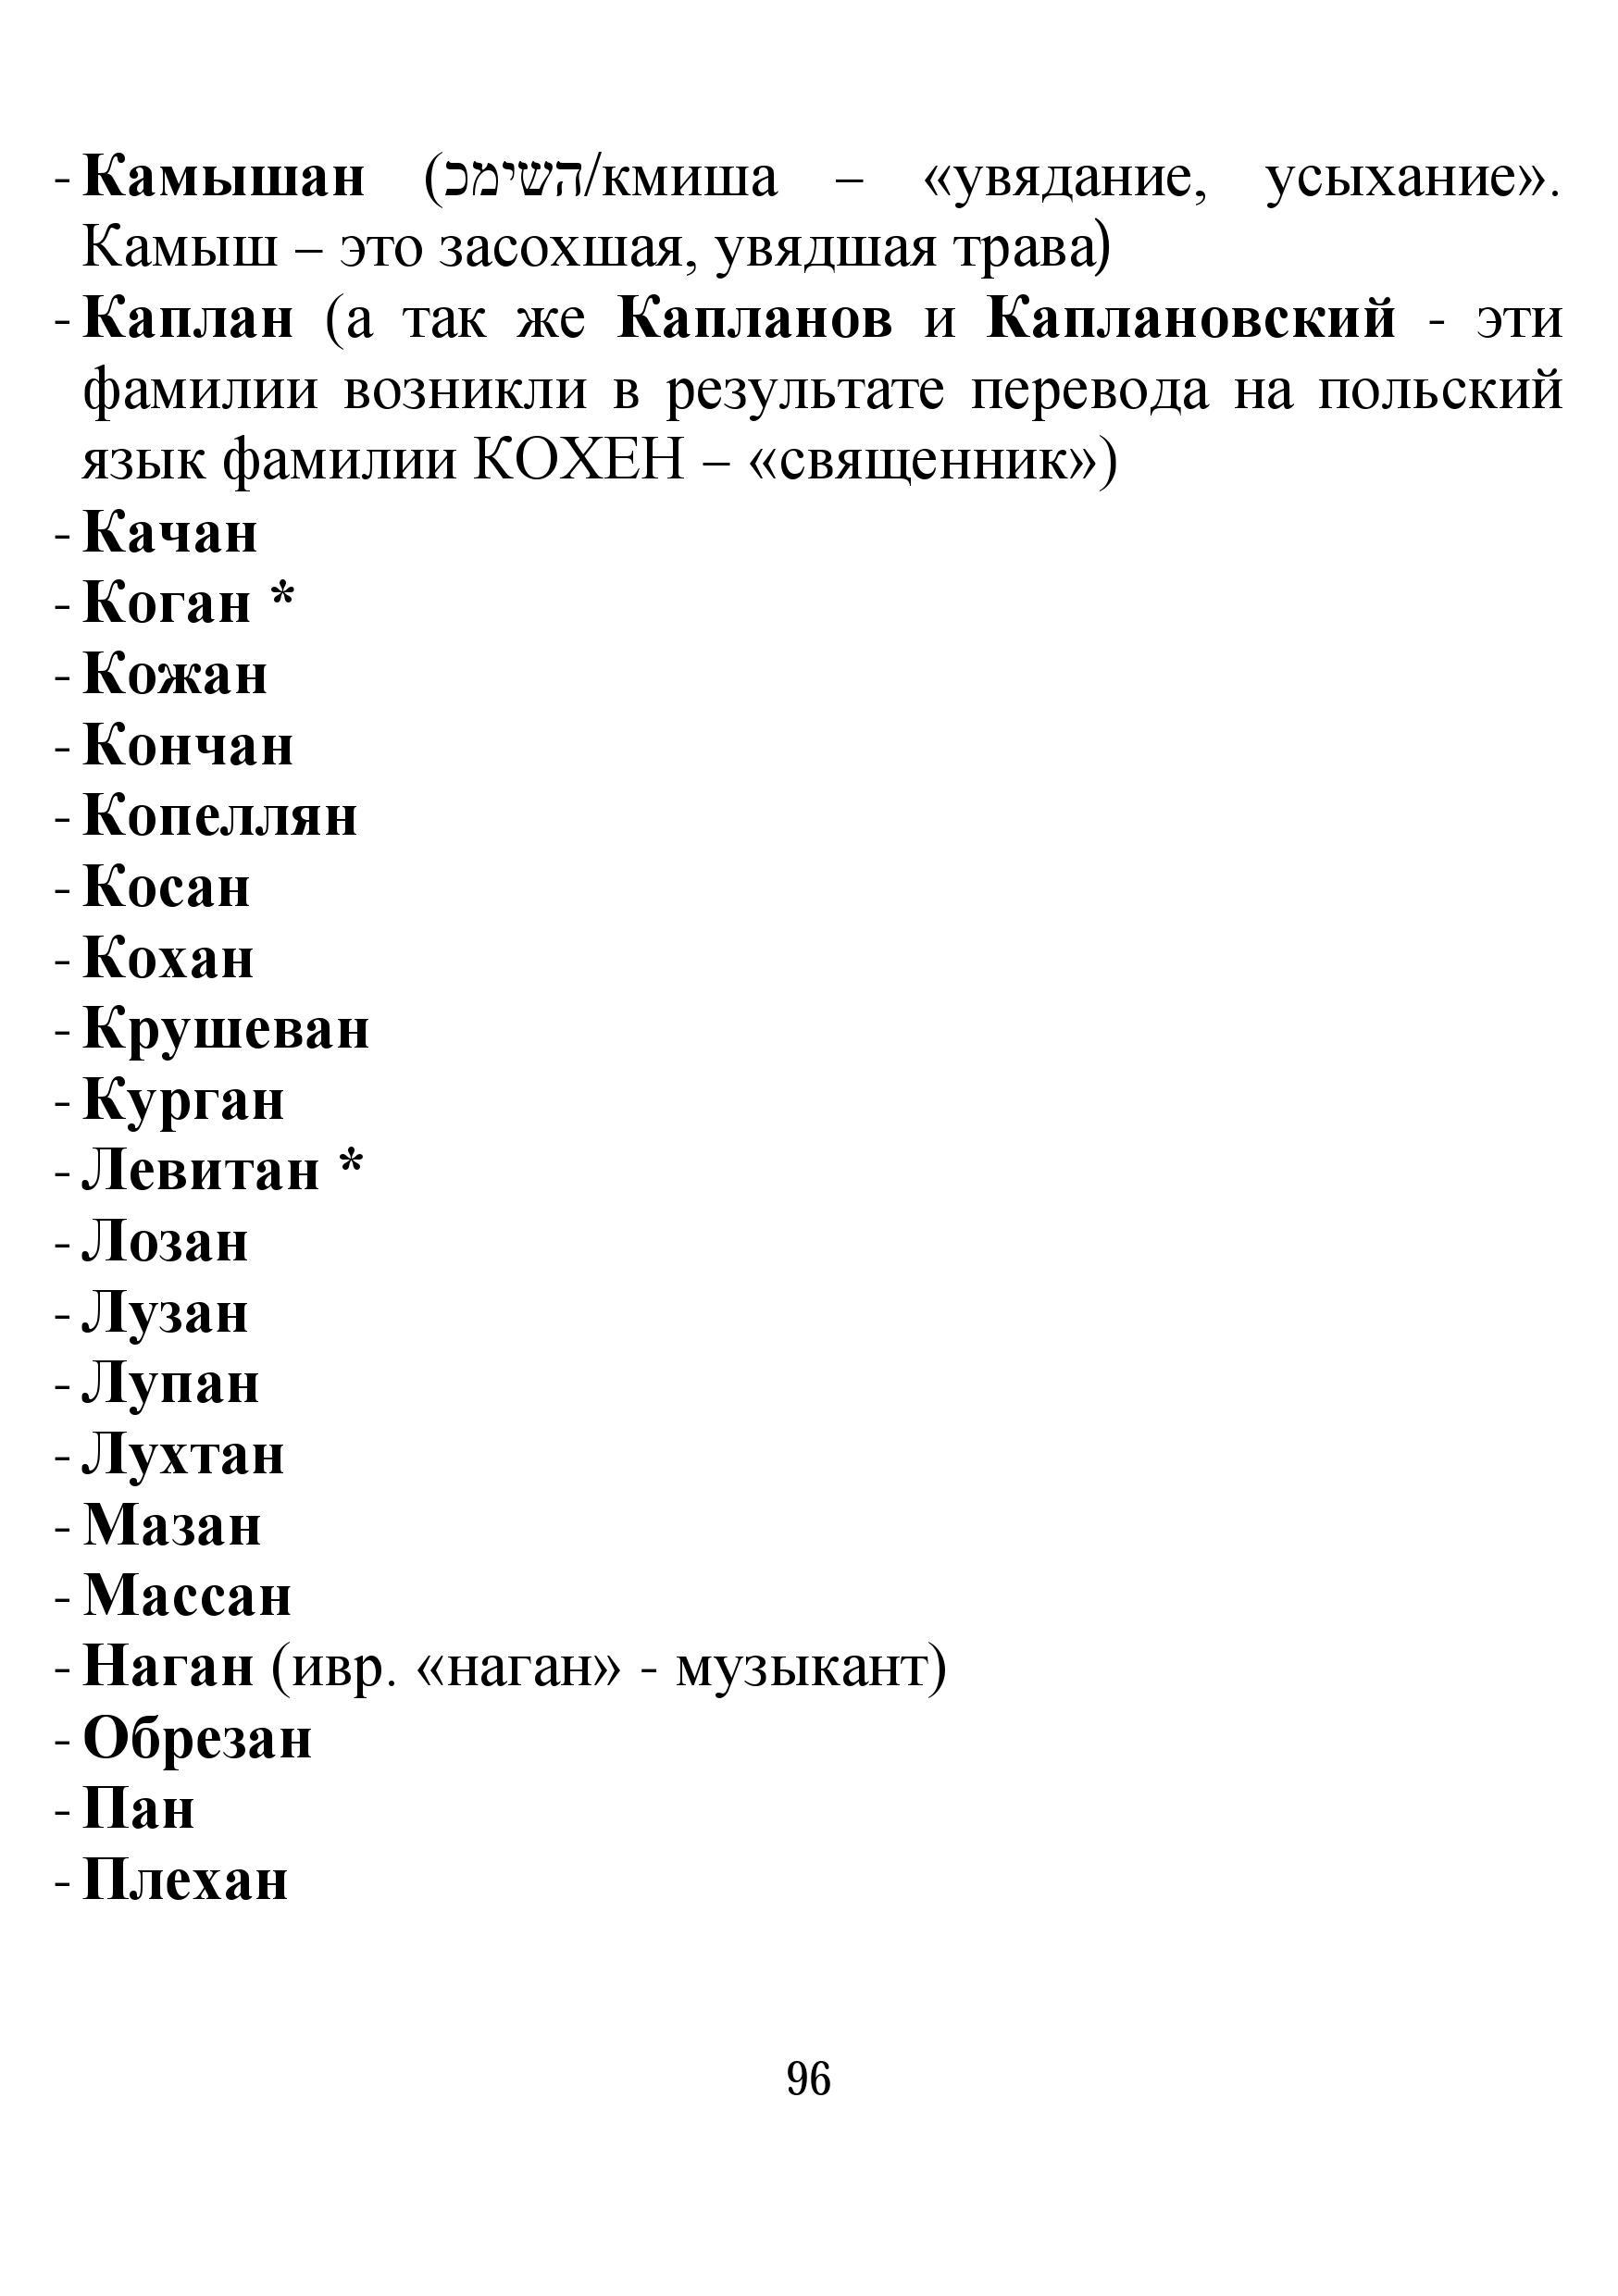 http://sf.uploads.ru/vCzkr.jpg